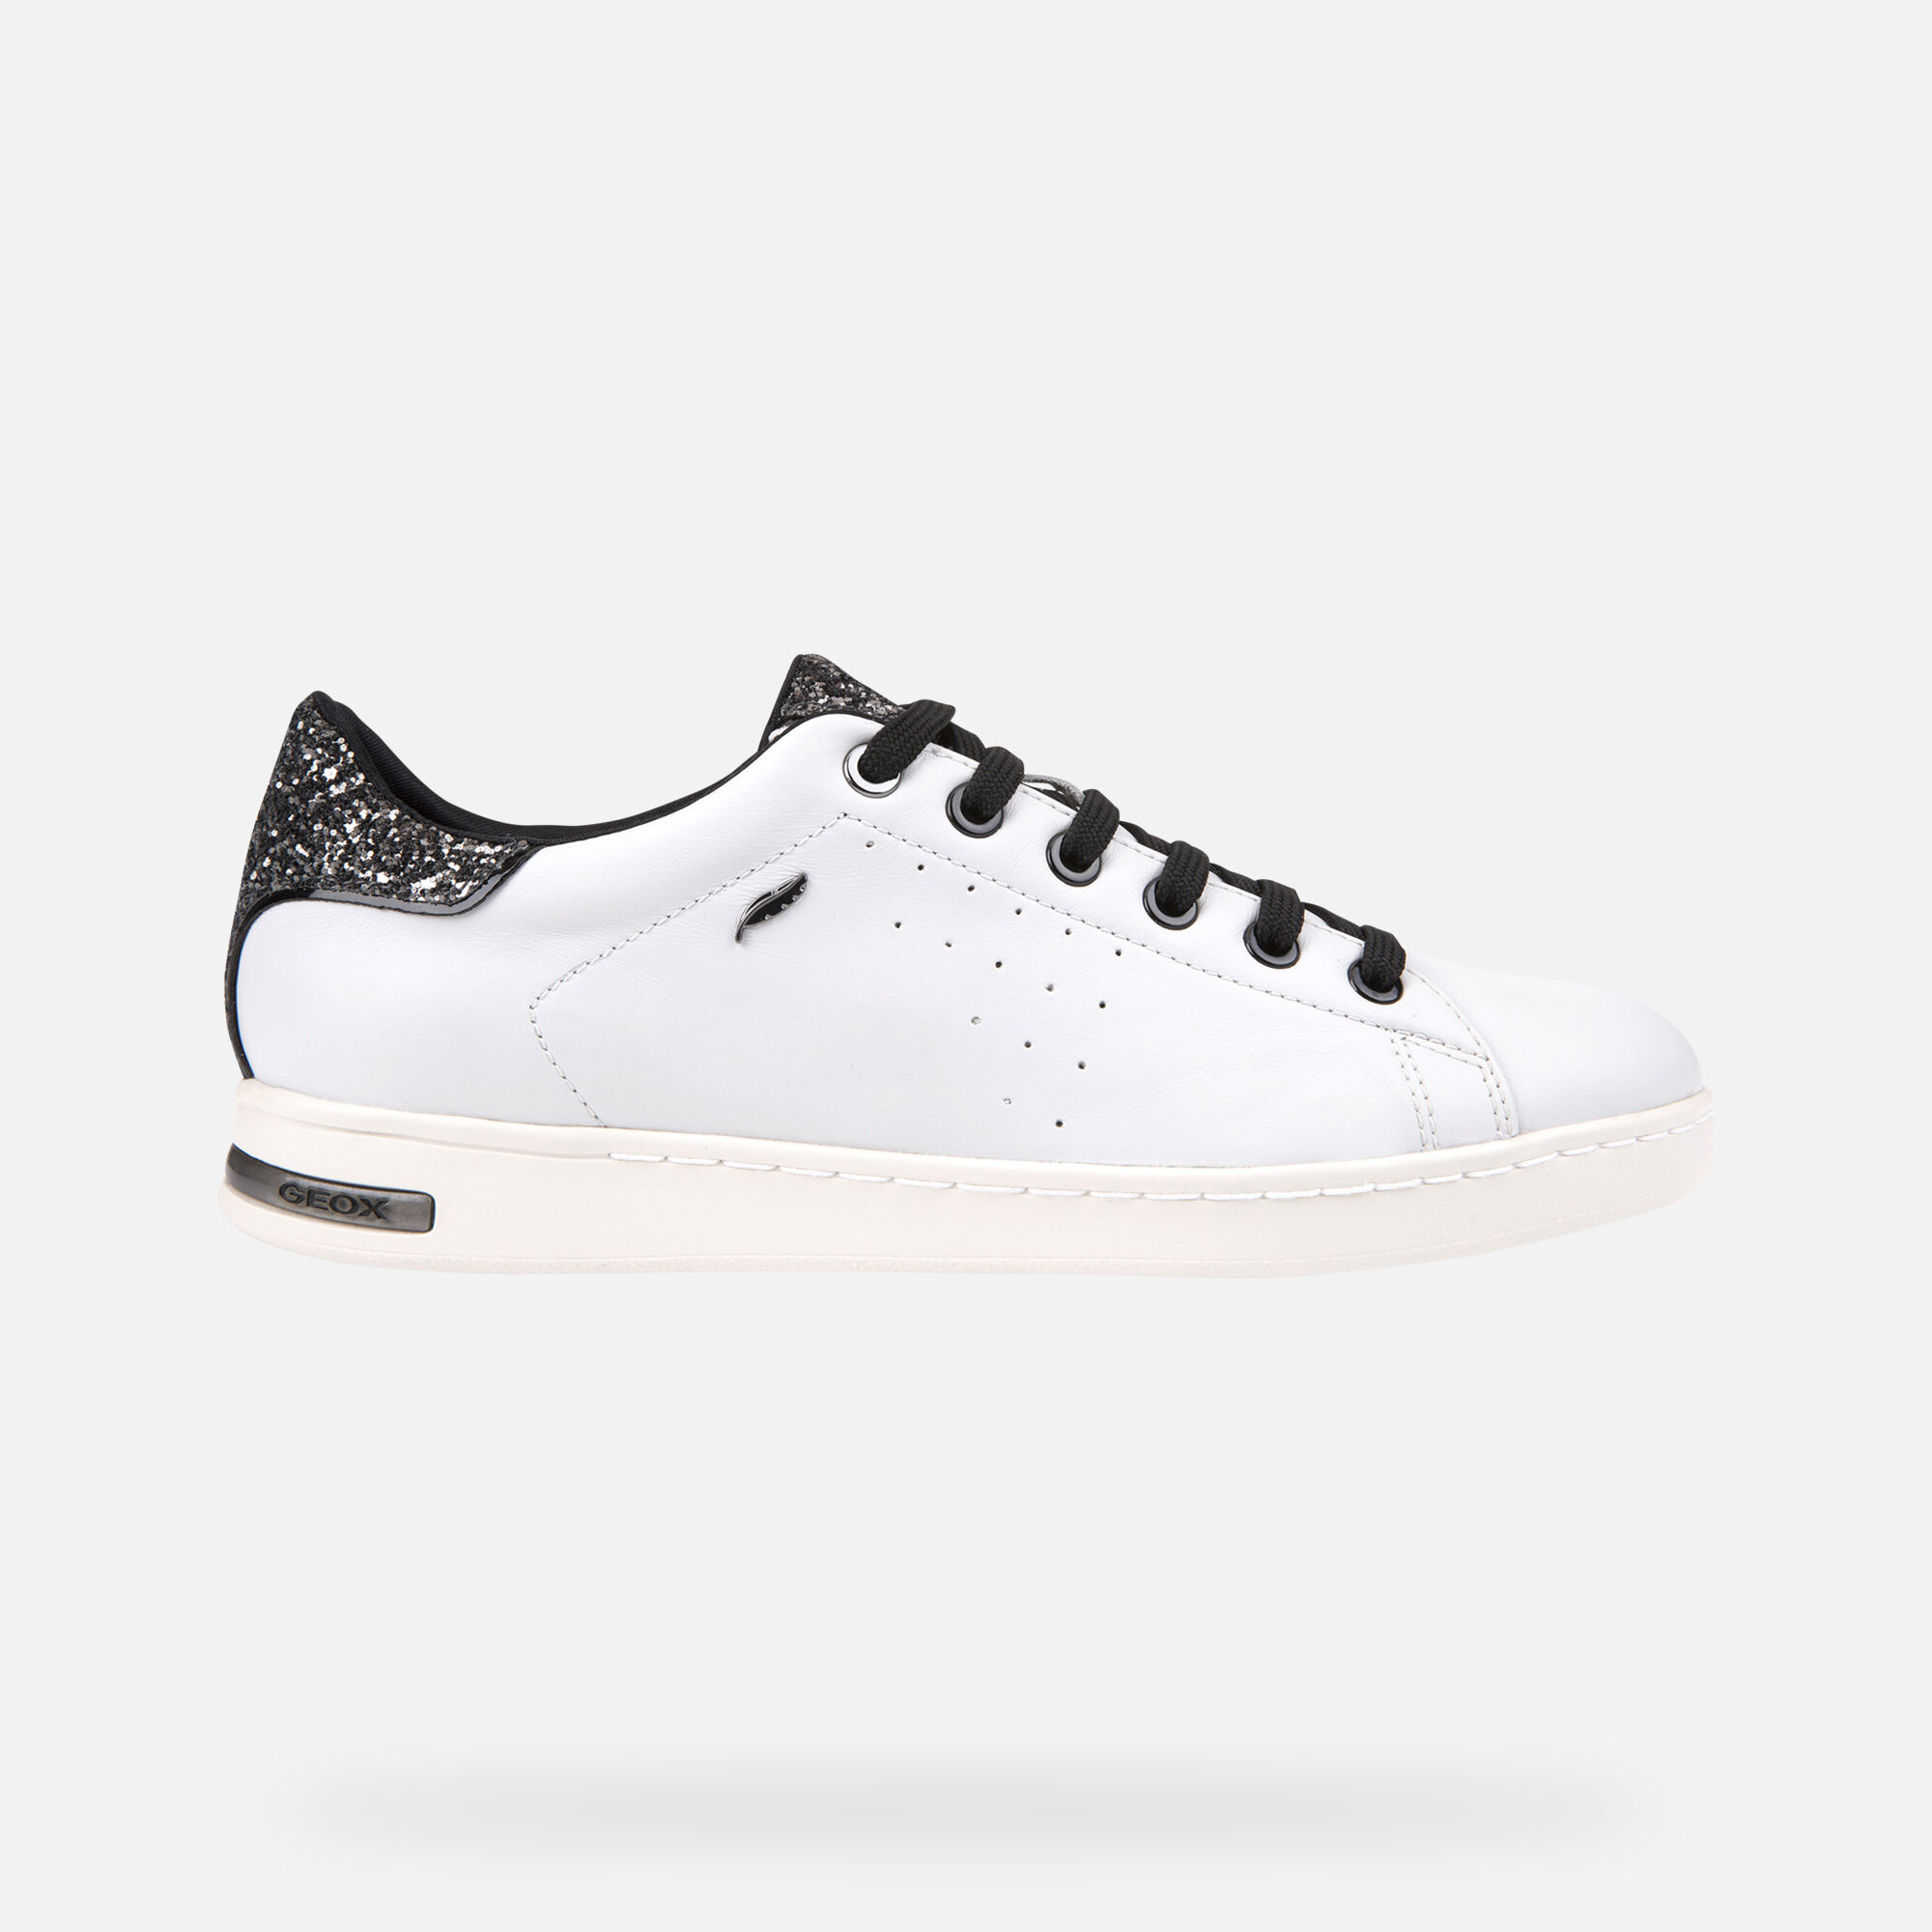 Shop Chaussures femme Geox D Jaysen A, Sneakers Basses femme